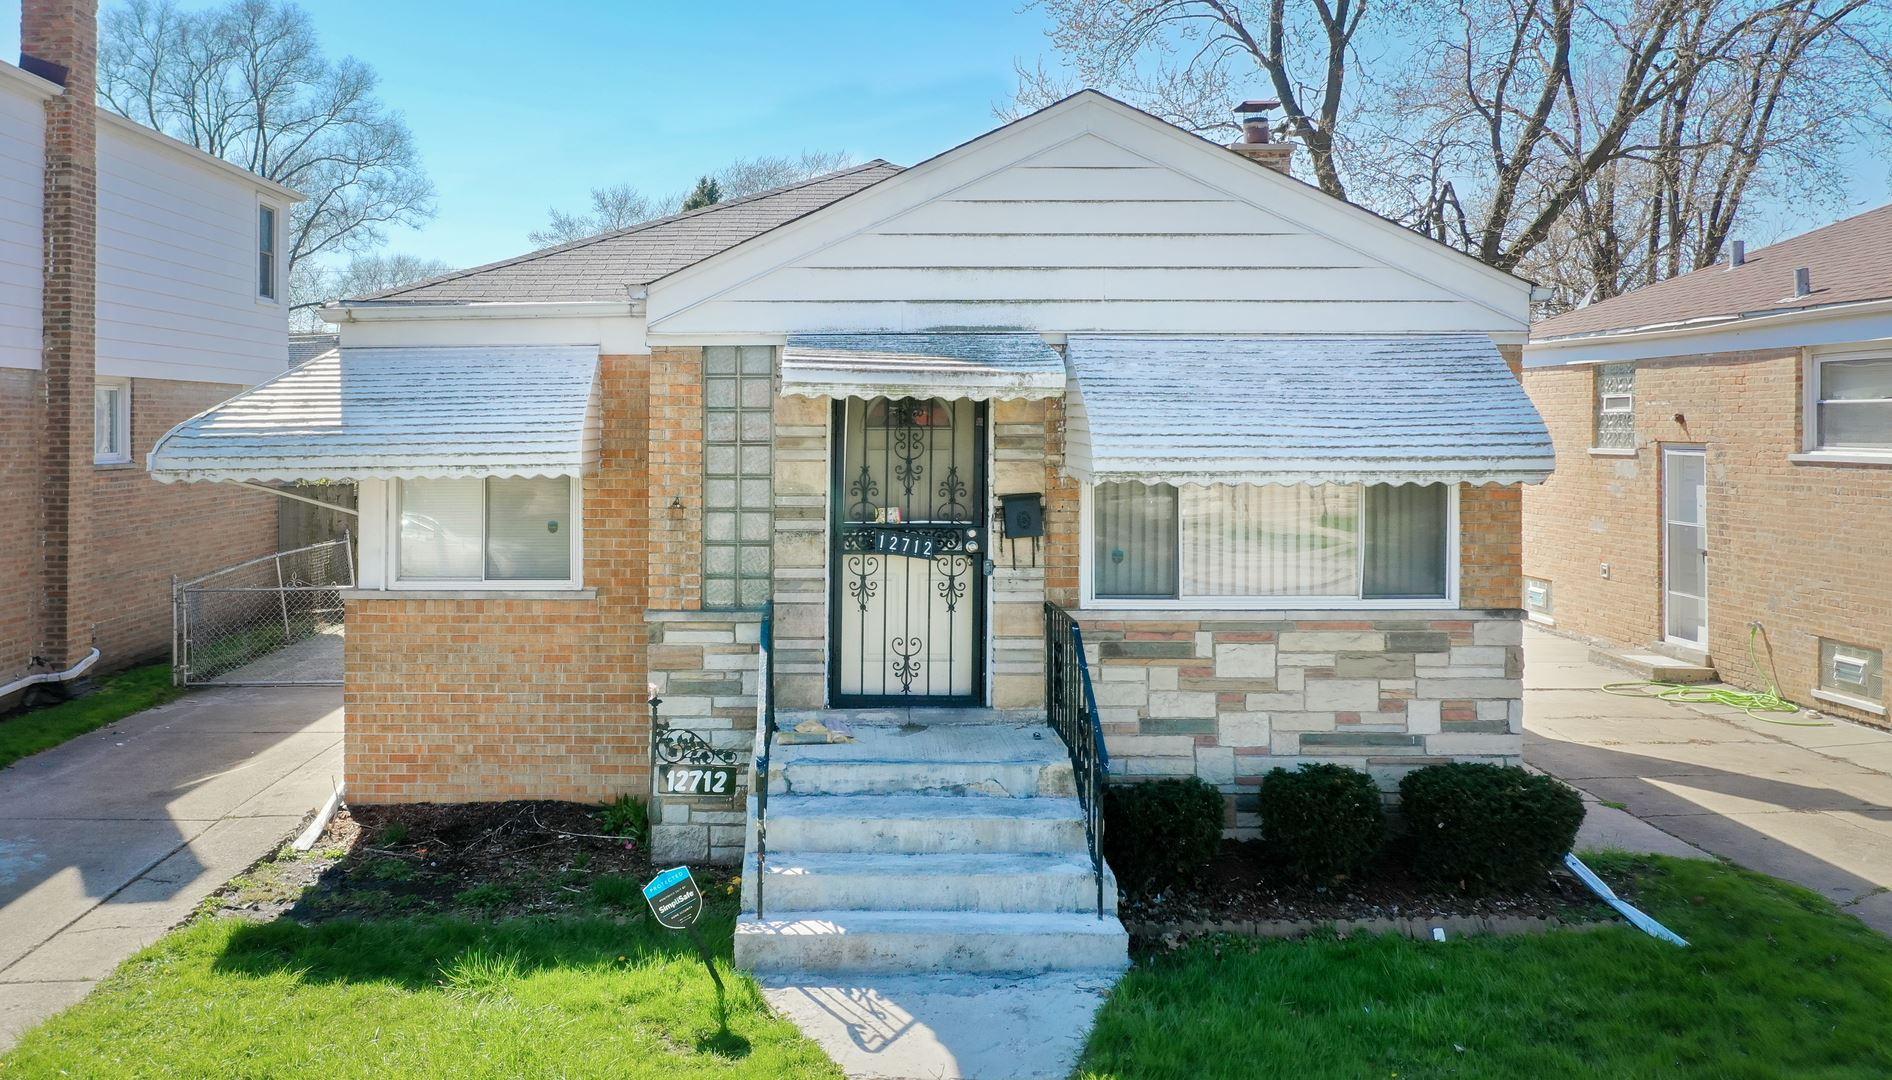 12712 S Elizabeth Street, Calumet Park, IL 60827 - #: 10694135